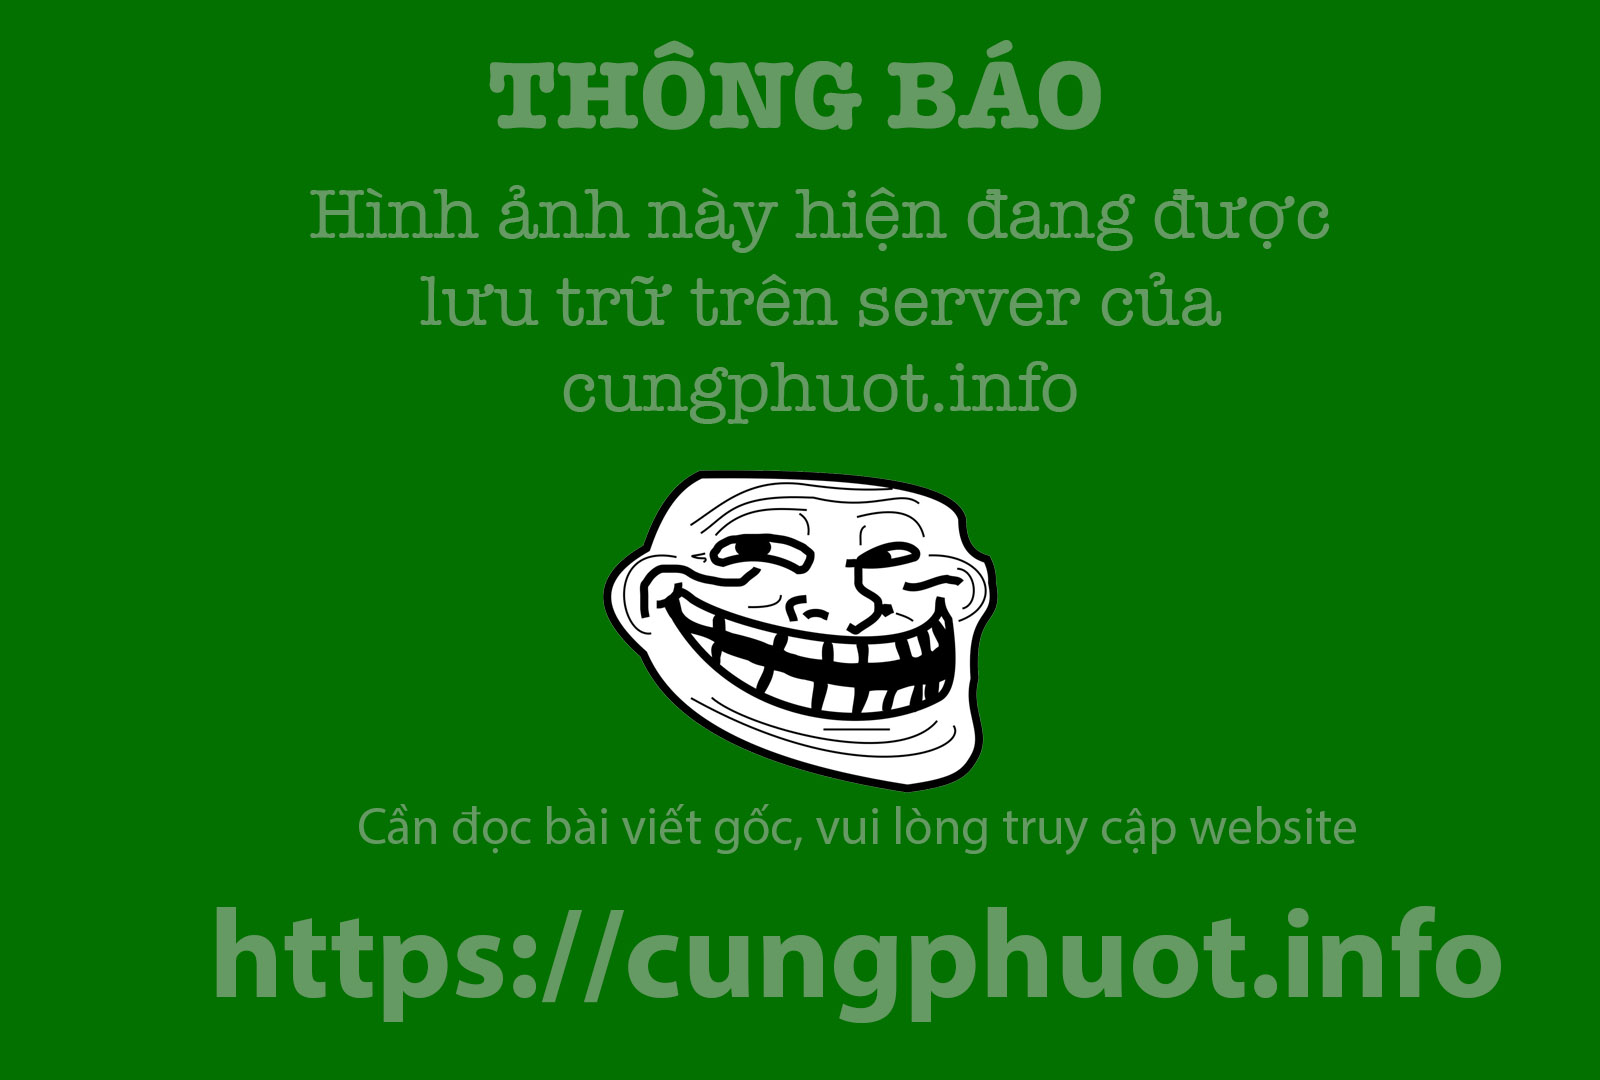 Vuon hoa tam giac mach o Ninh Binh hinh anh 3